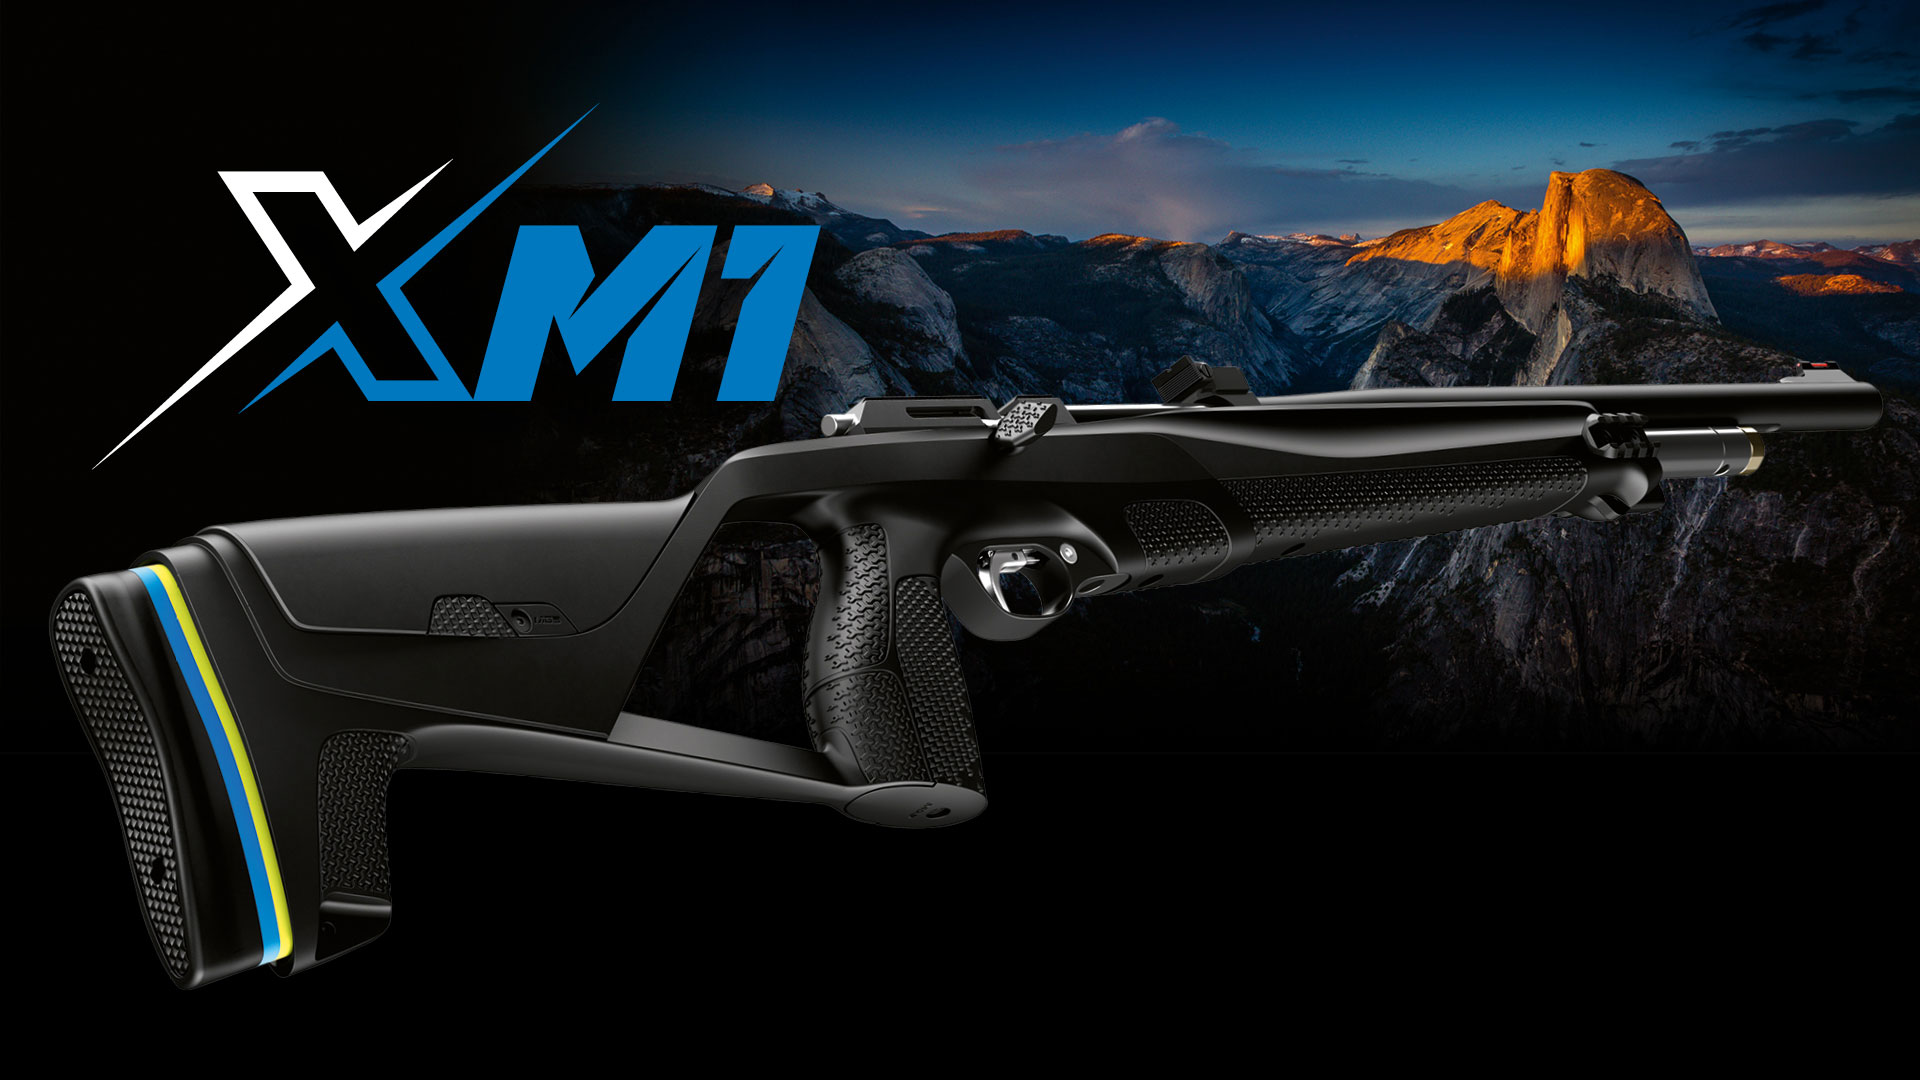 XM1 News